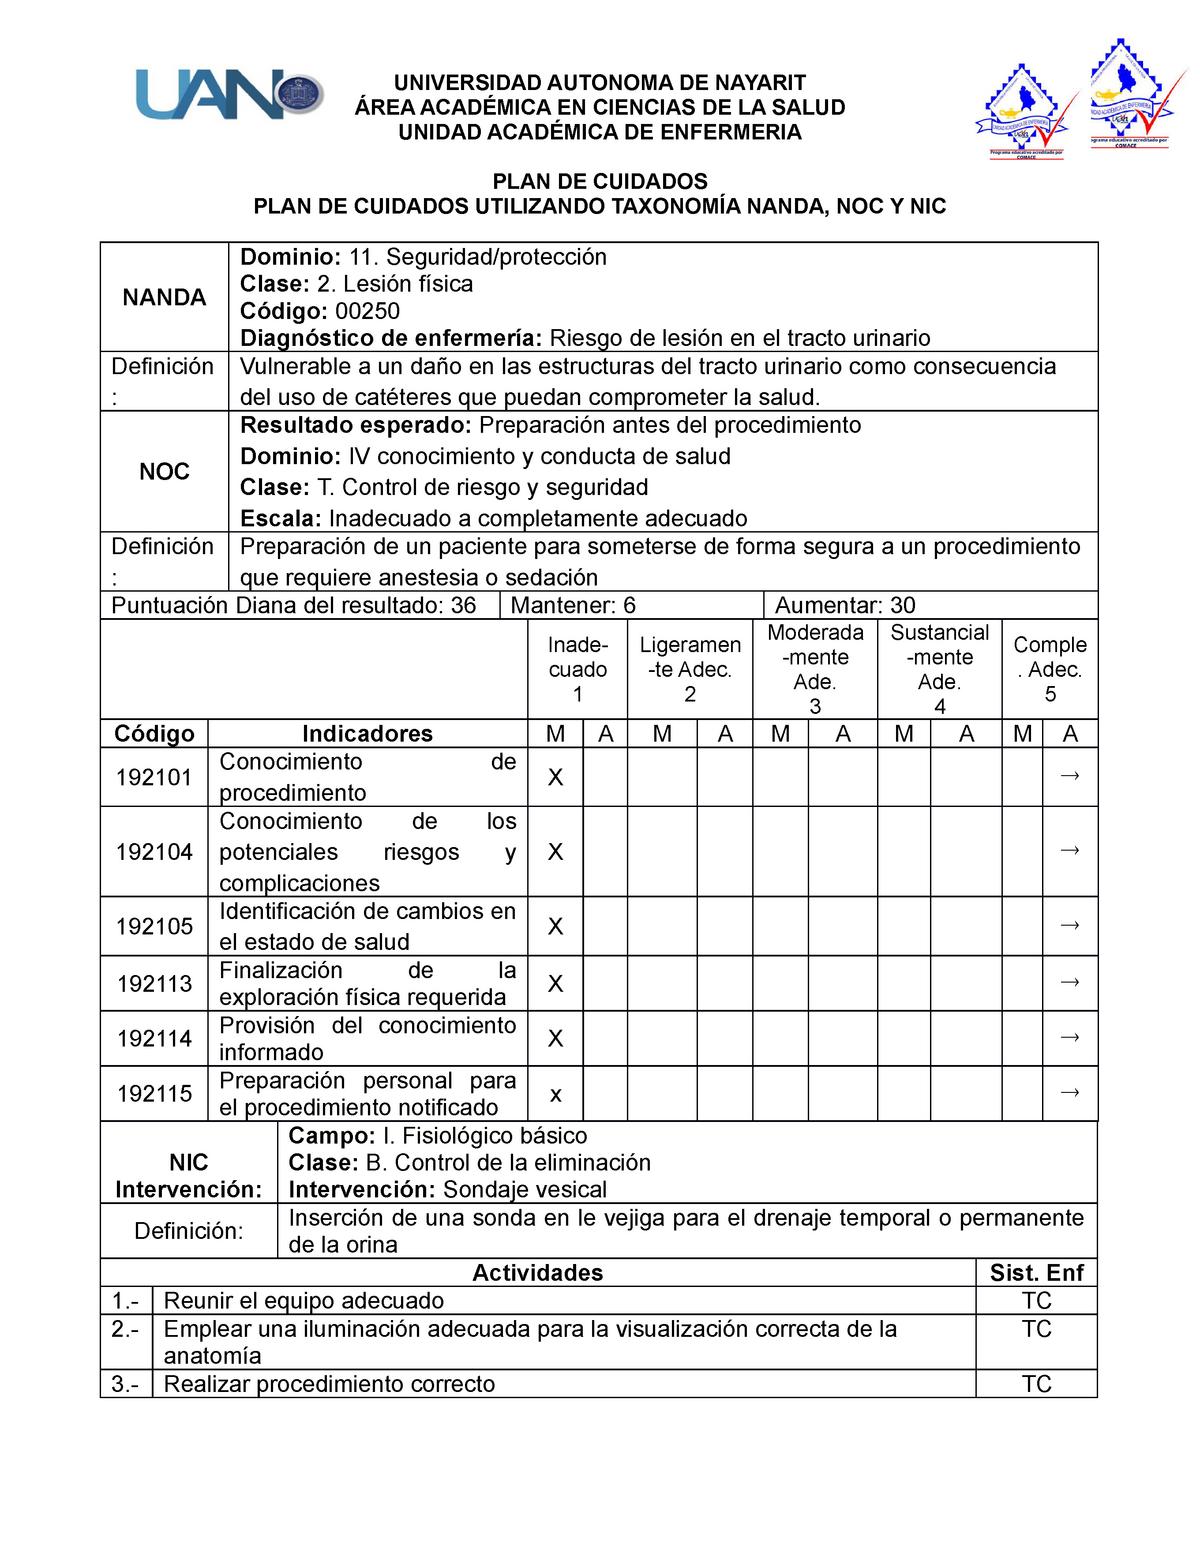 definicion sondaje vesical permanente